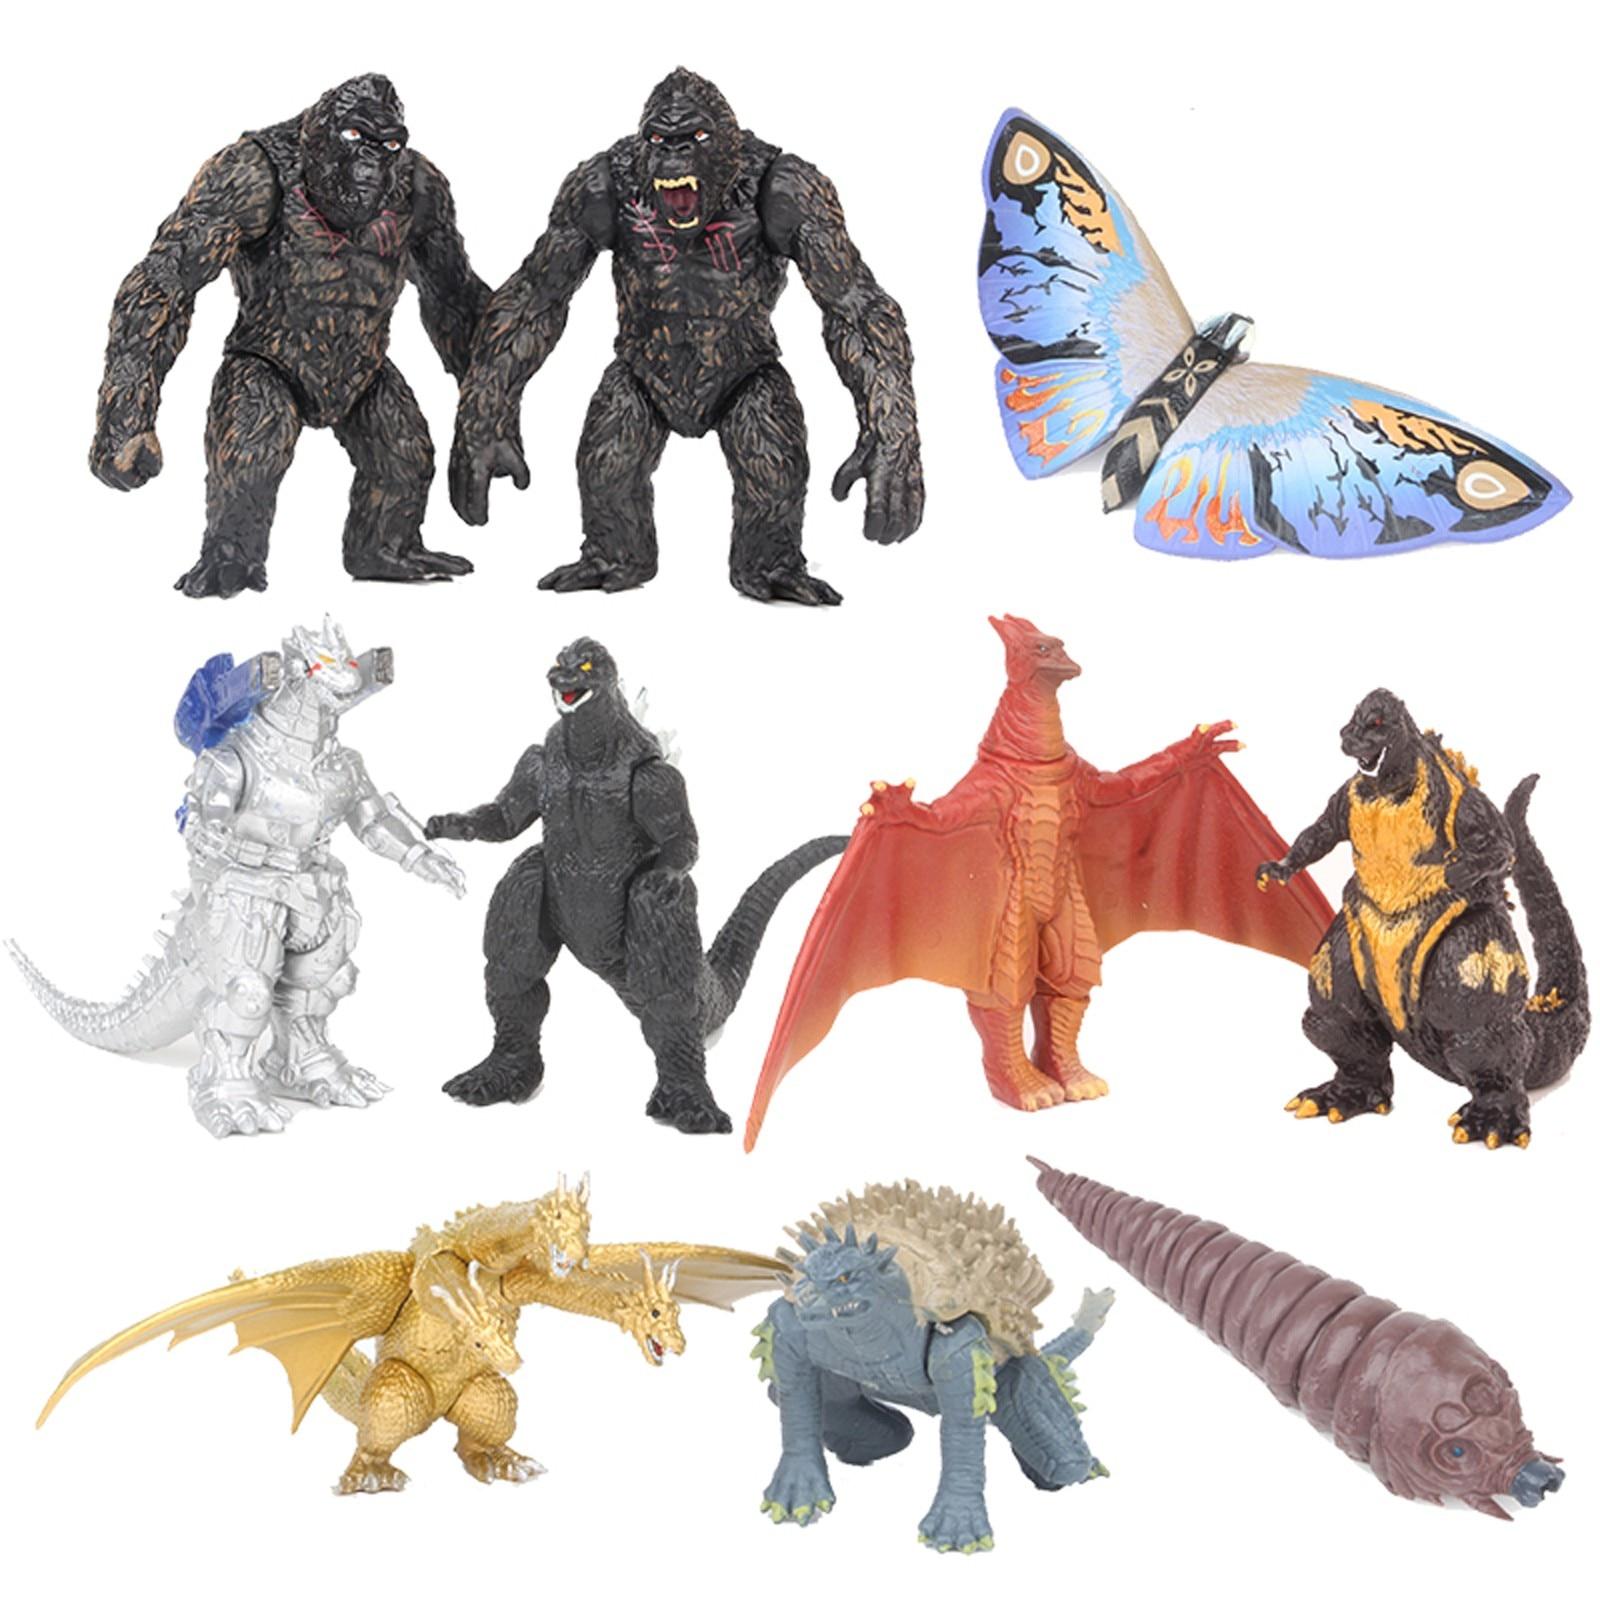 jo s toy dino rivals roarivores metriacanthosaurus dinosaur toys sound effect action figure toys boy gift movie section in stock 10pcs/ Set GodzillaVs King Kong Action Toys Figures Mechagodzilla Gigan Anguirus Action Figure Pvc Gift Toy Dinosaur Toys